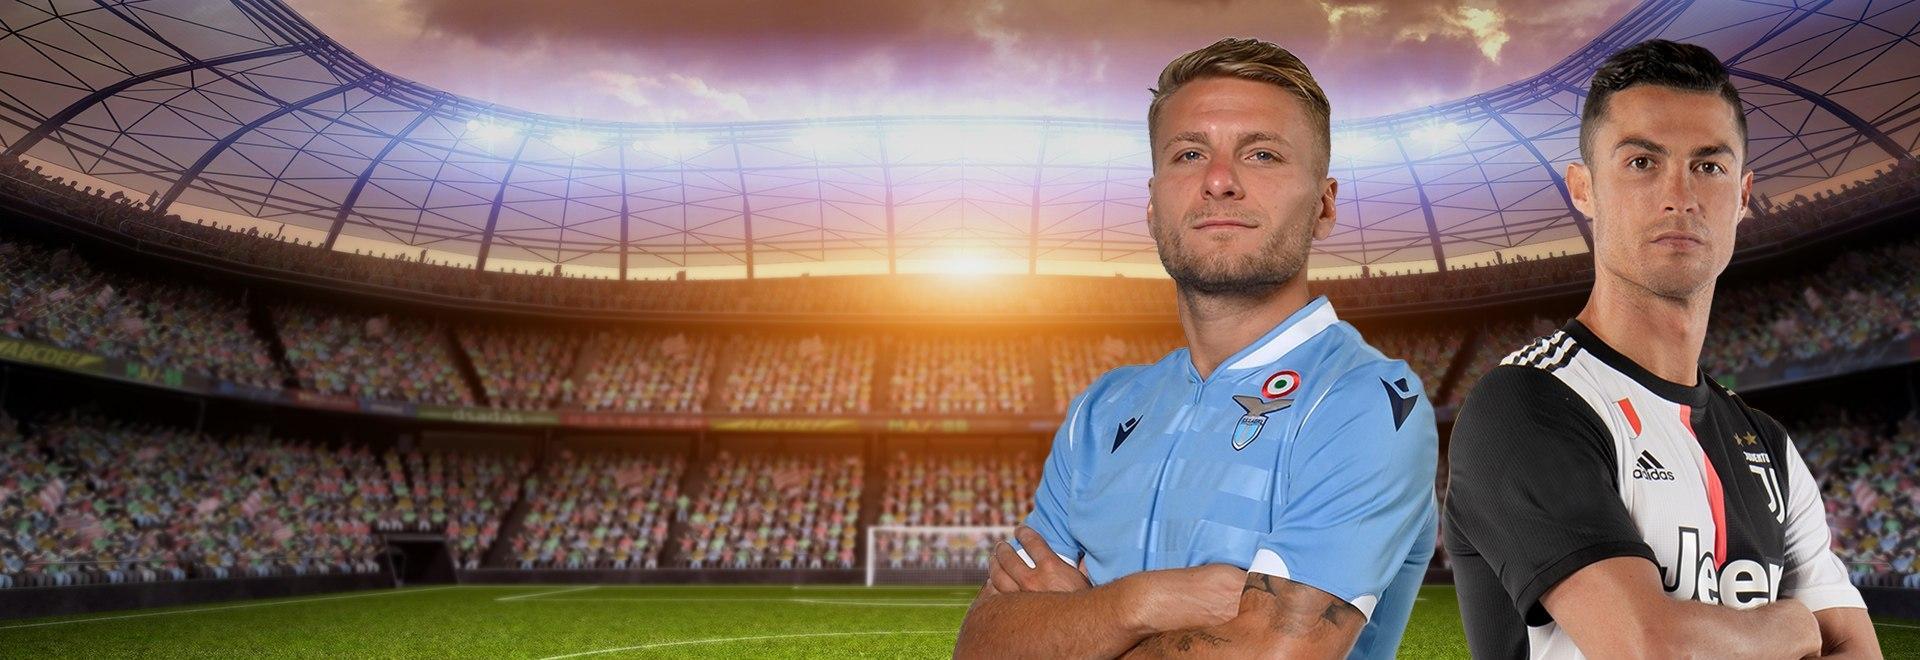 Lazio - Juventus 15a g.